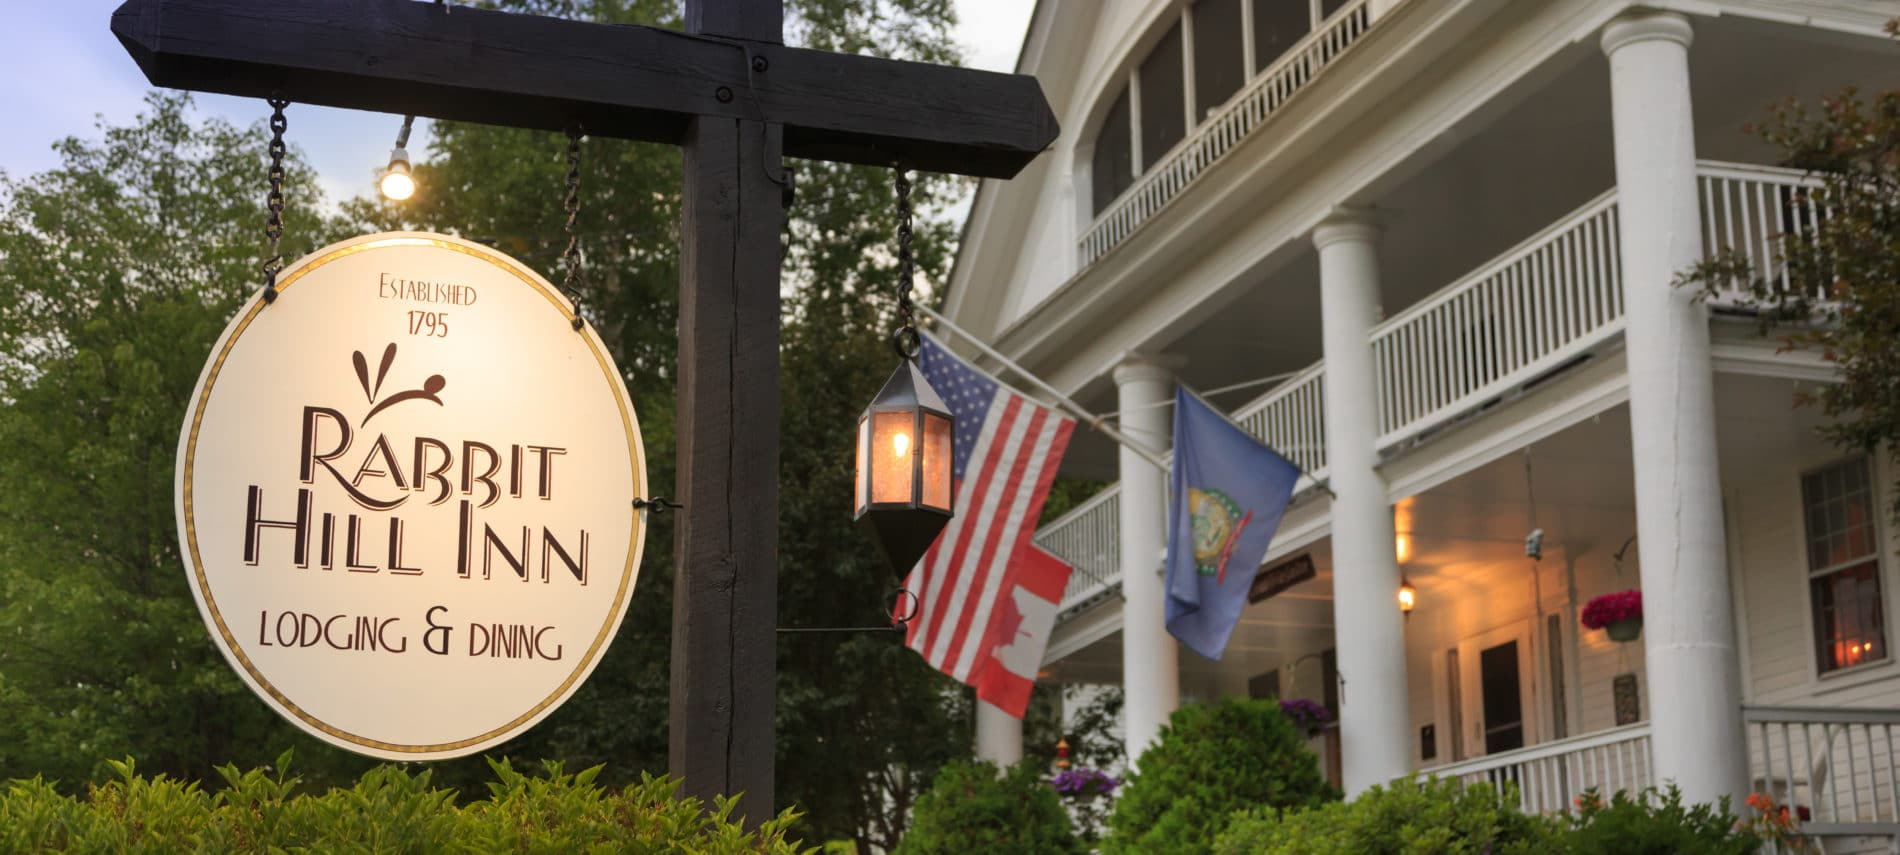 Rabbit Hill Inn and restaurant in Vermont